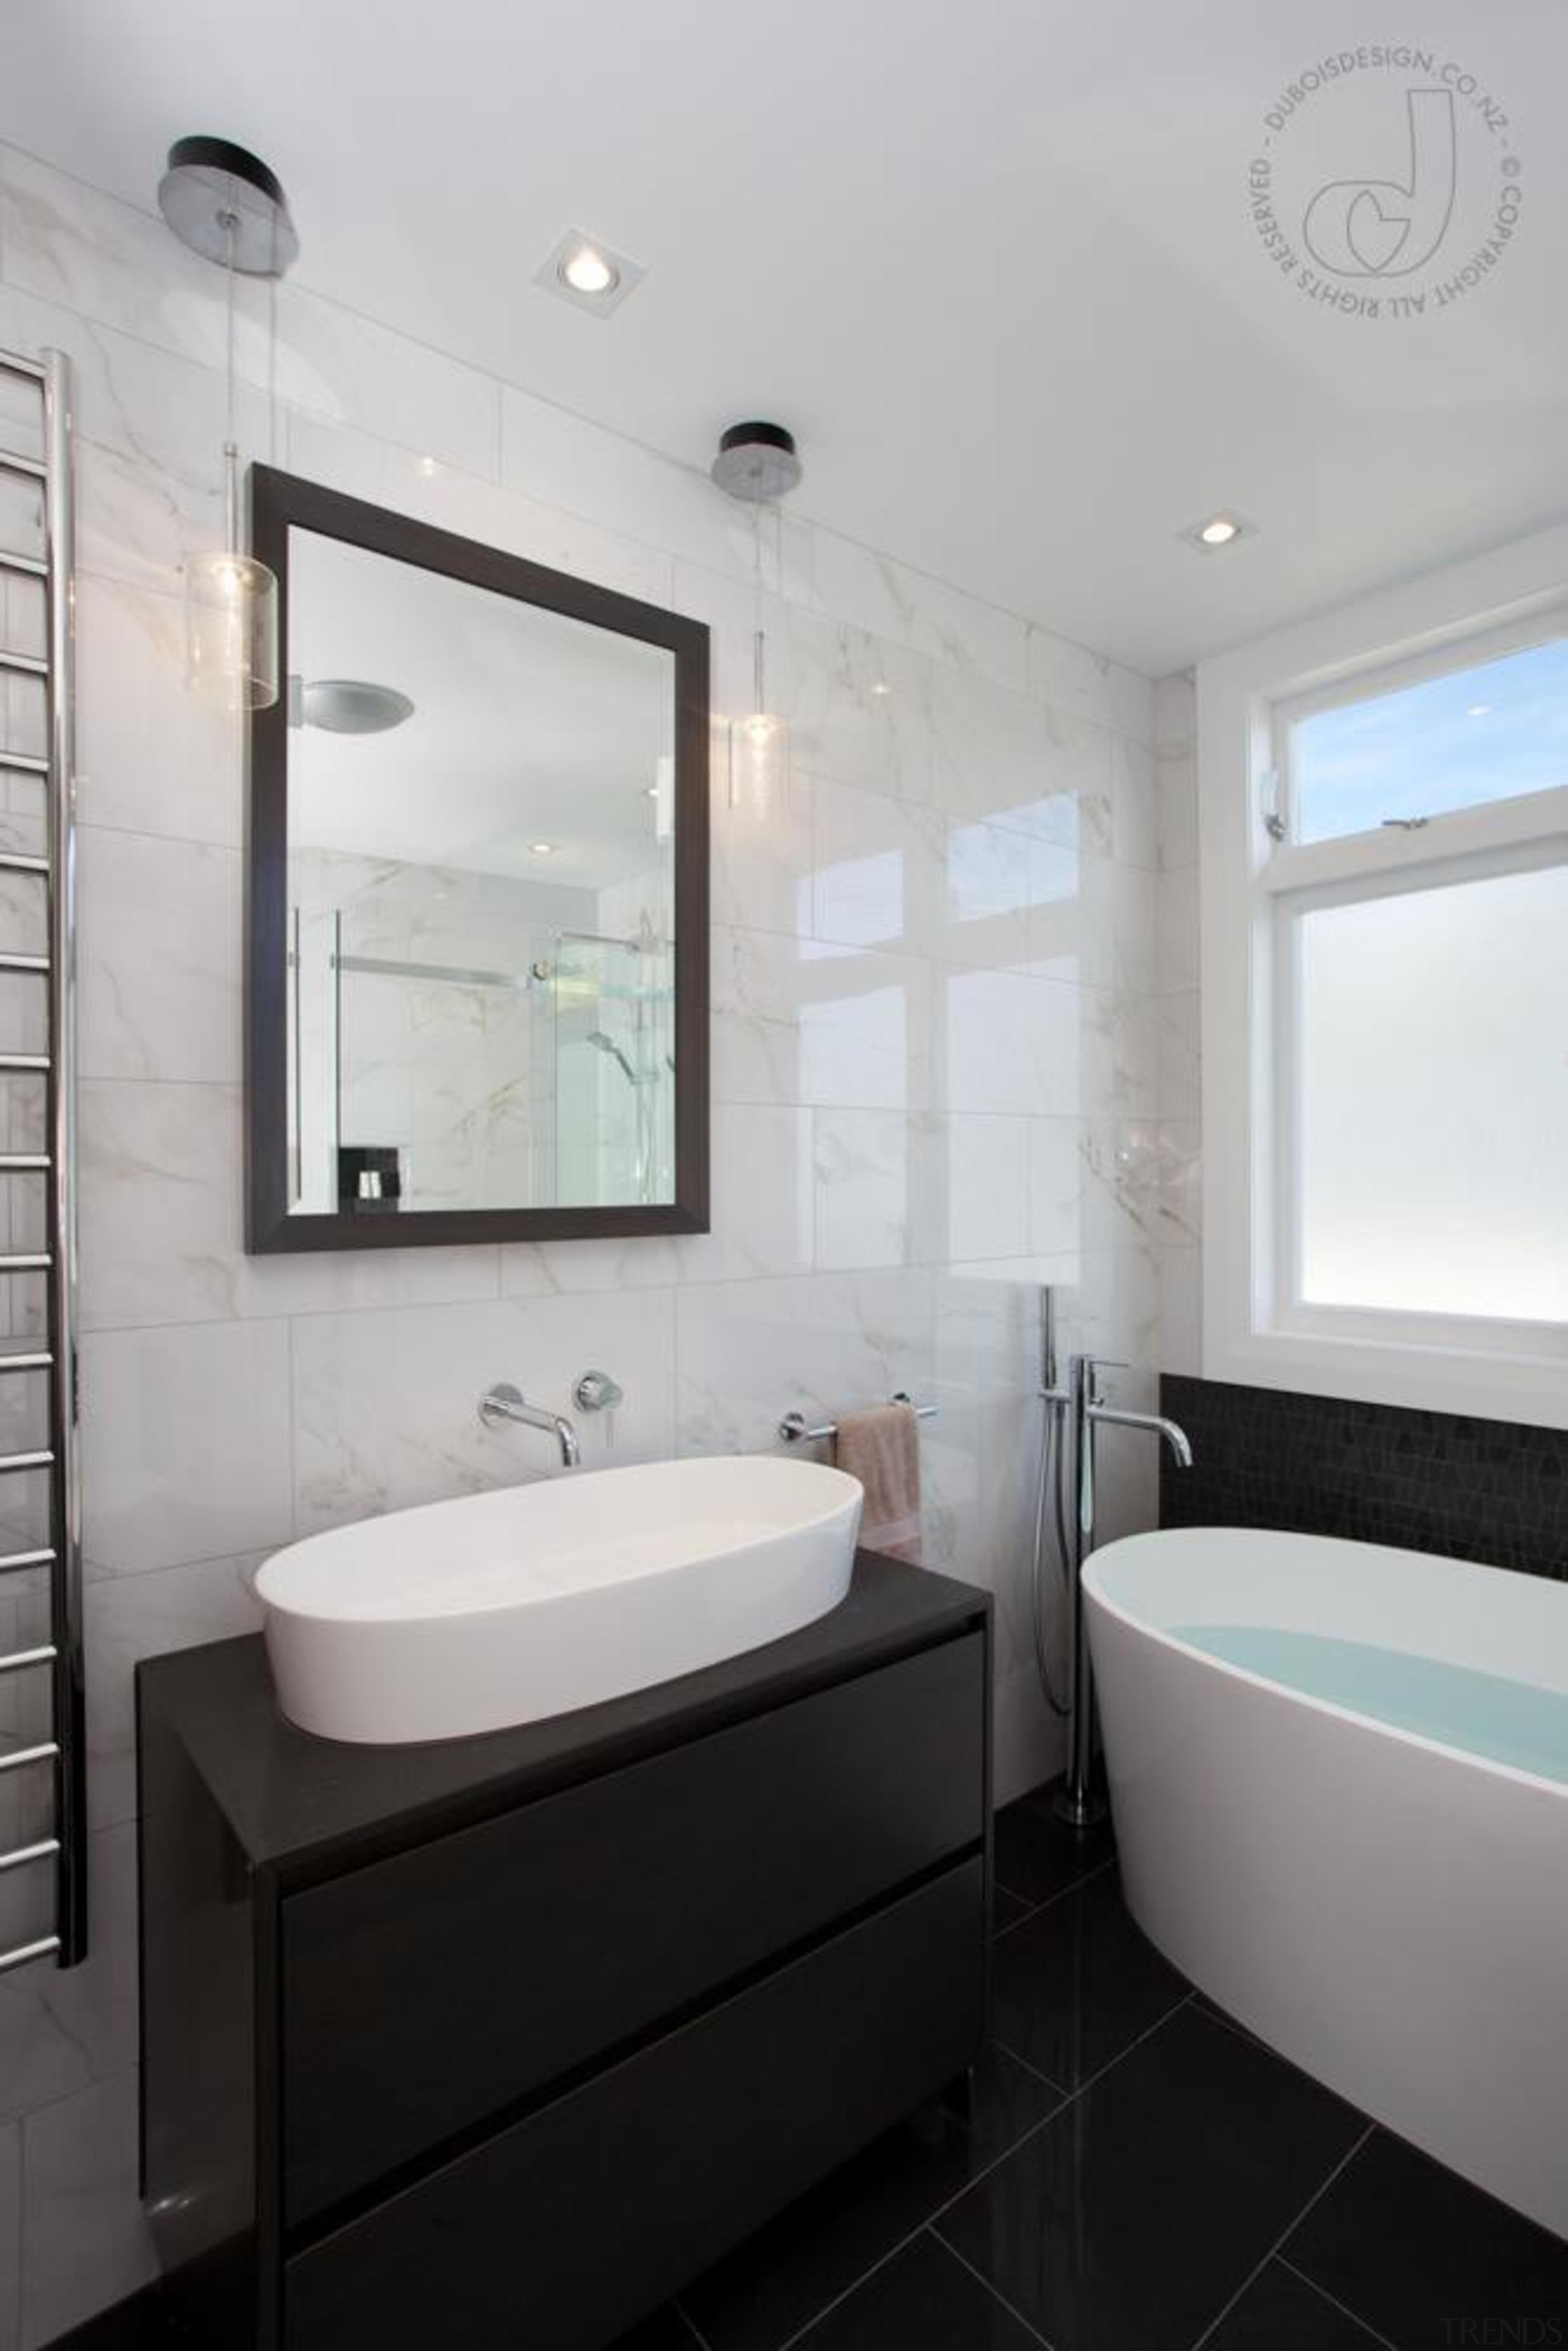 Stylish Bathroom - Stylish Bathroom - architecture | architecture, bathroom, home, interior design, room, sink, window, gray, black